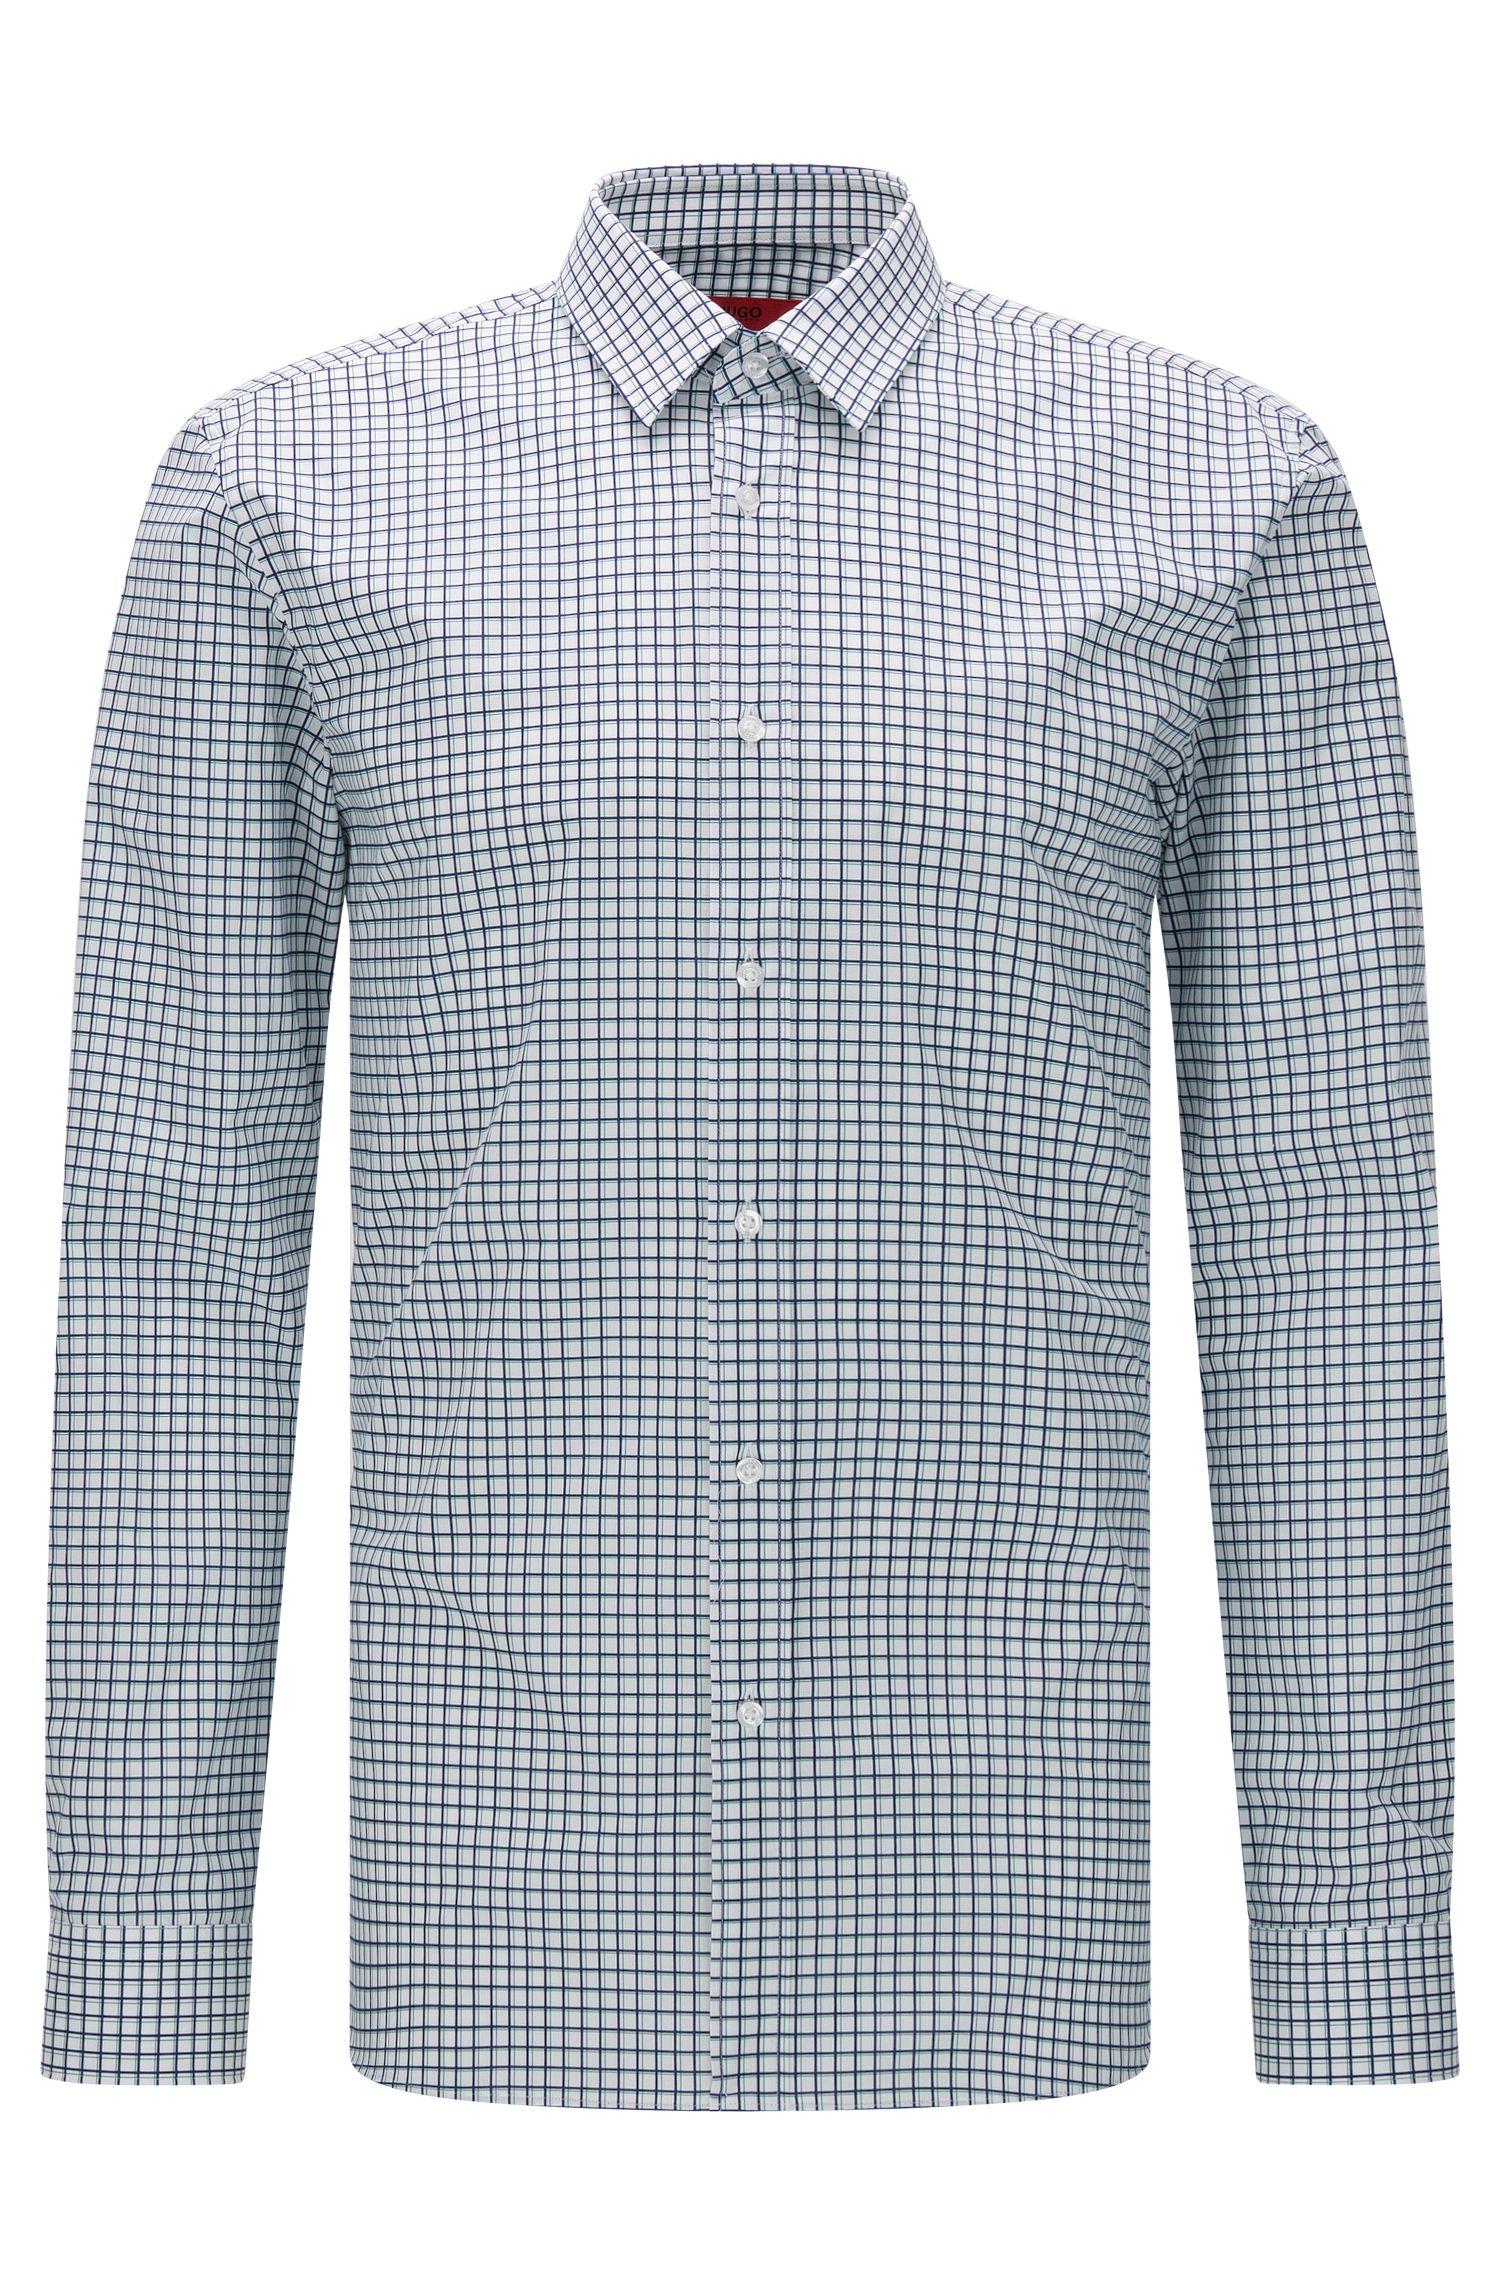 'Elisha'   Exra Slim Fit, Cotton Button Down Shirt